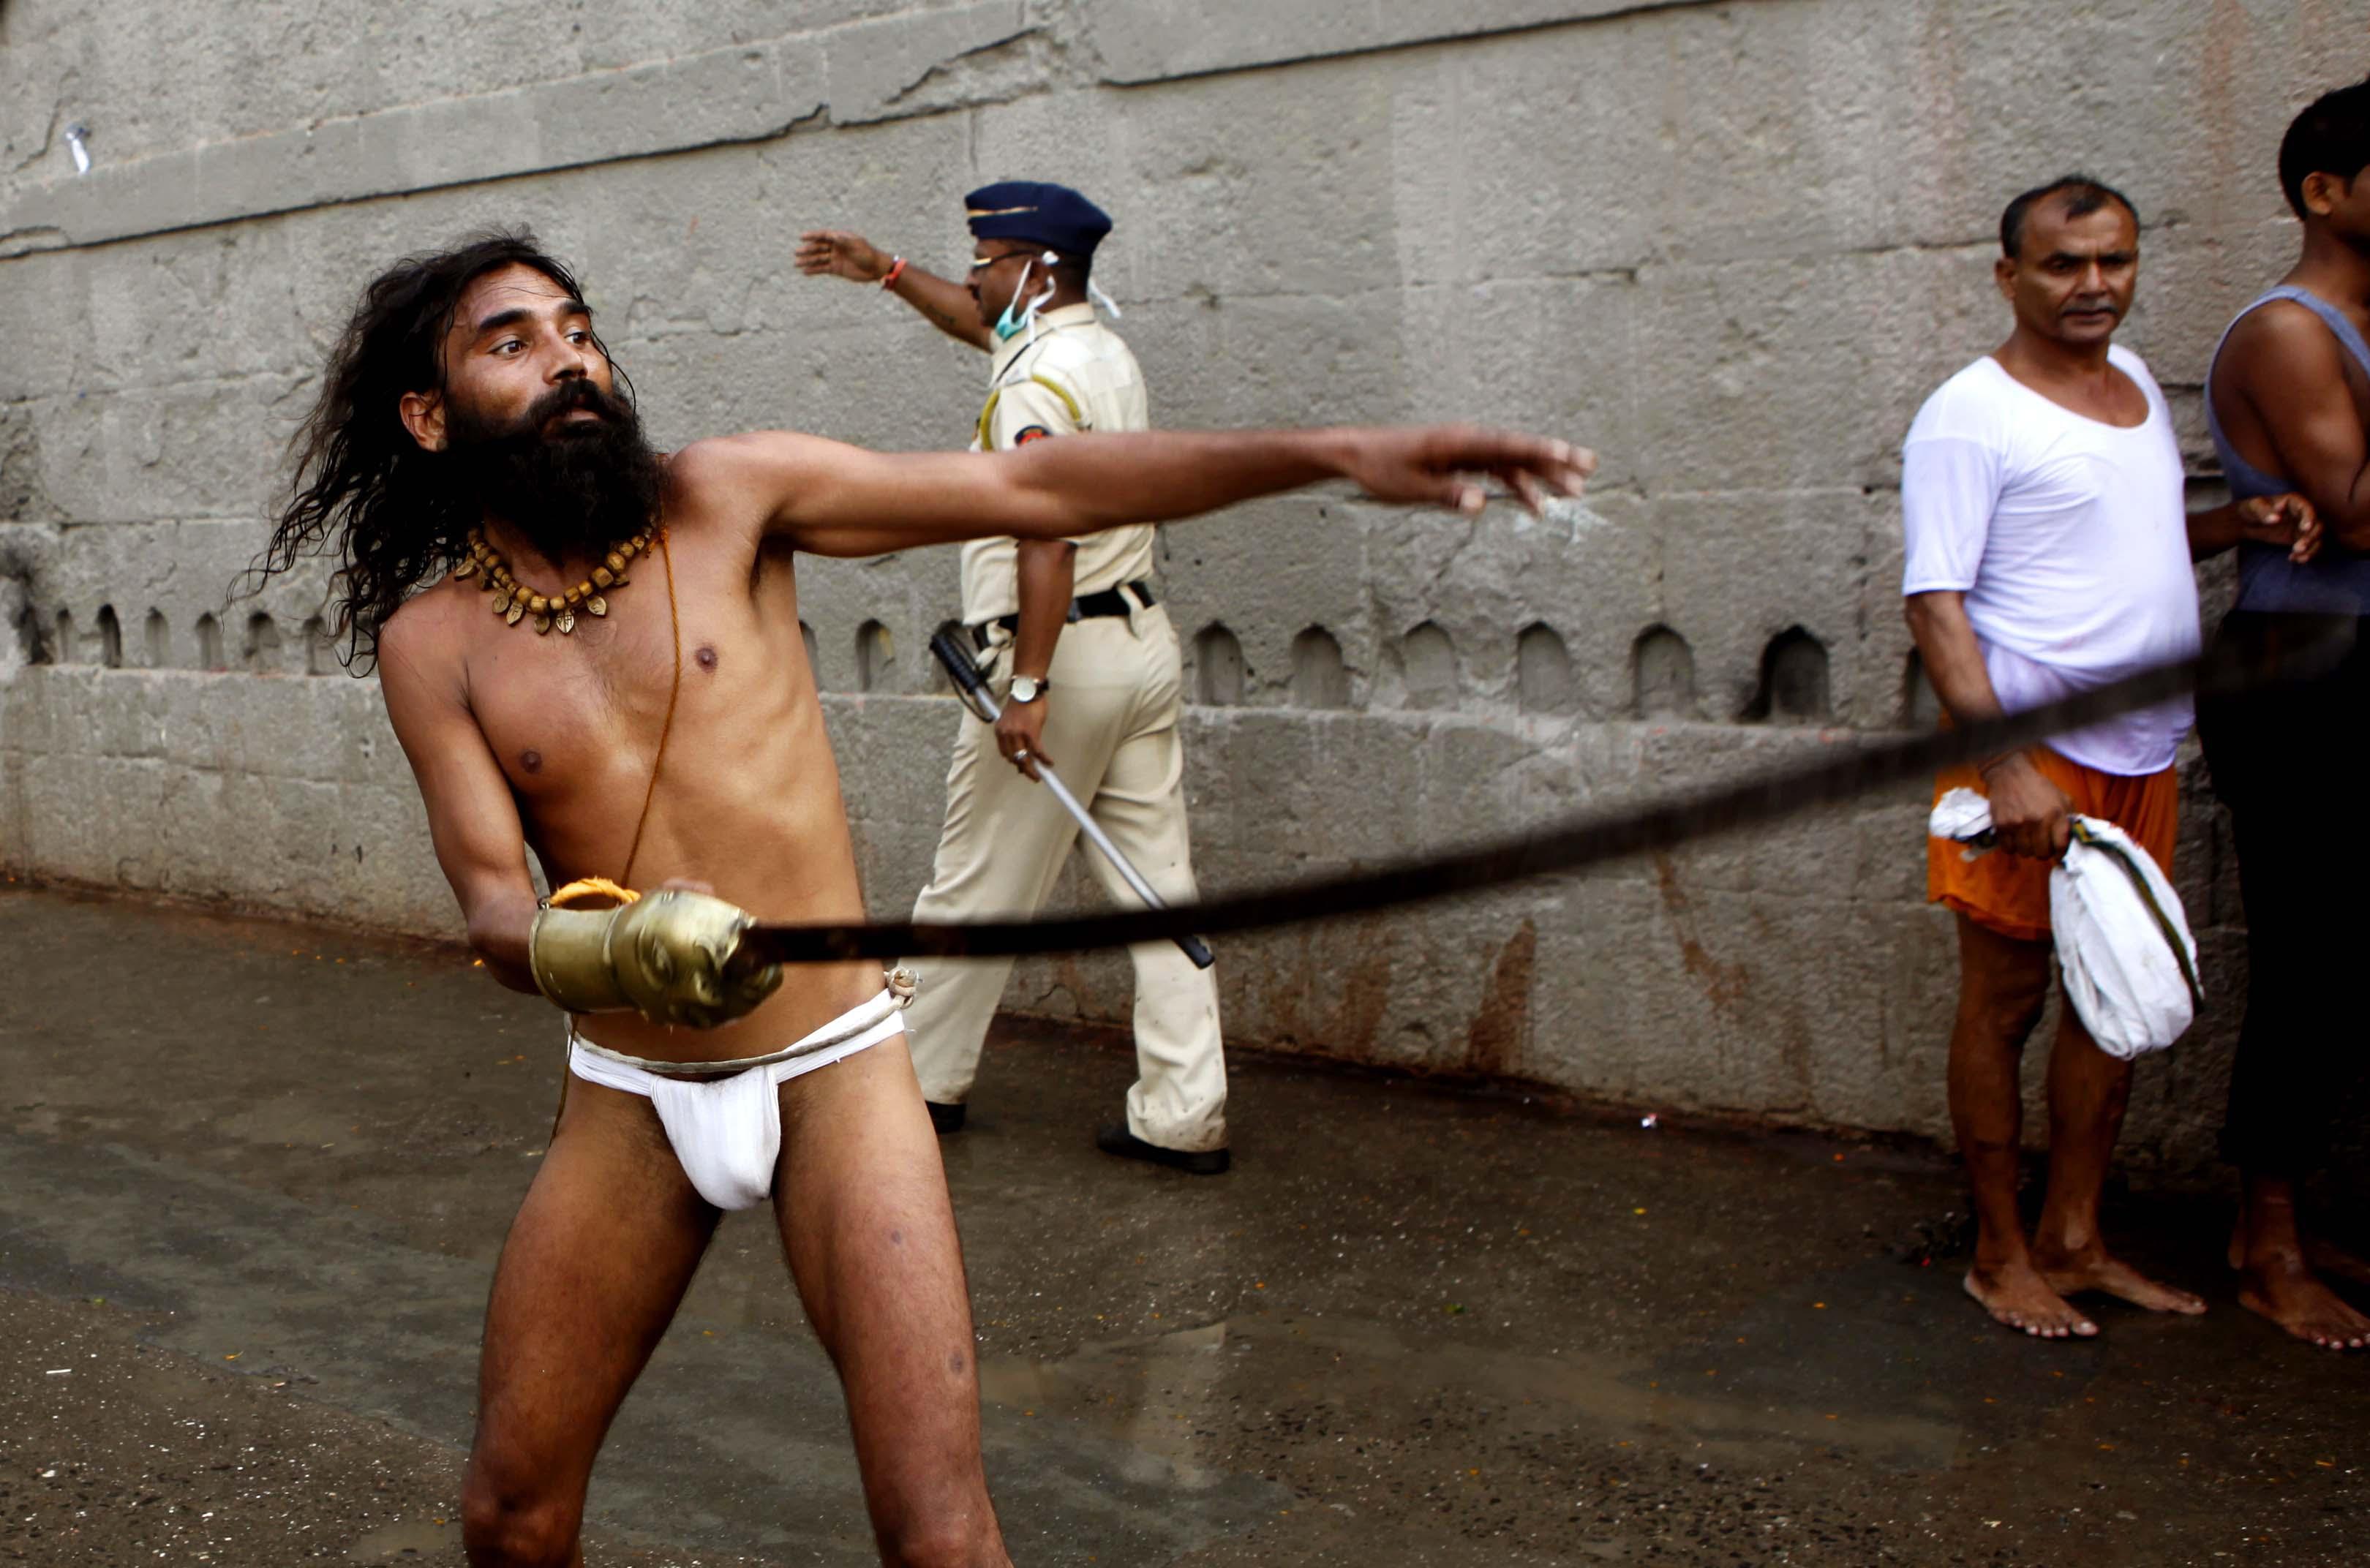 A sadhu showing sword tricks during the second Shahi Snan of Simhastha Kumbh Mela in Nashik, India, on Sept. 13, 2015.